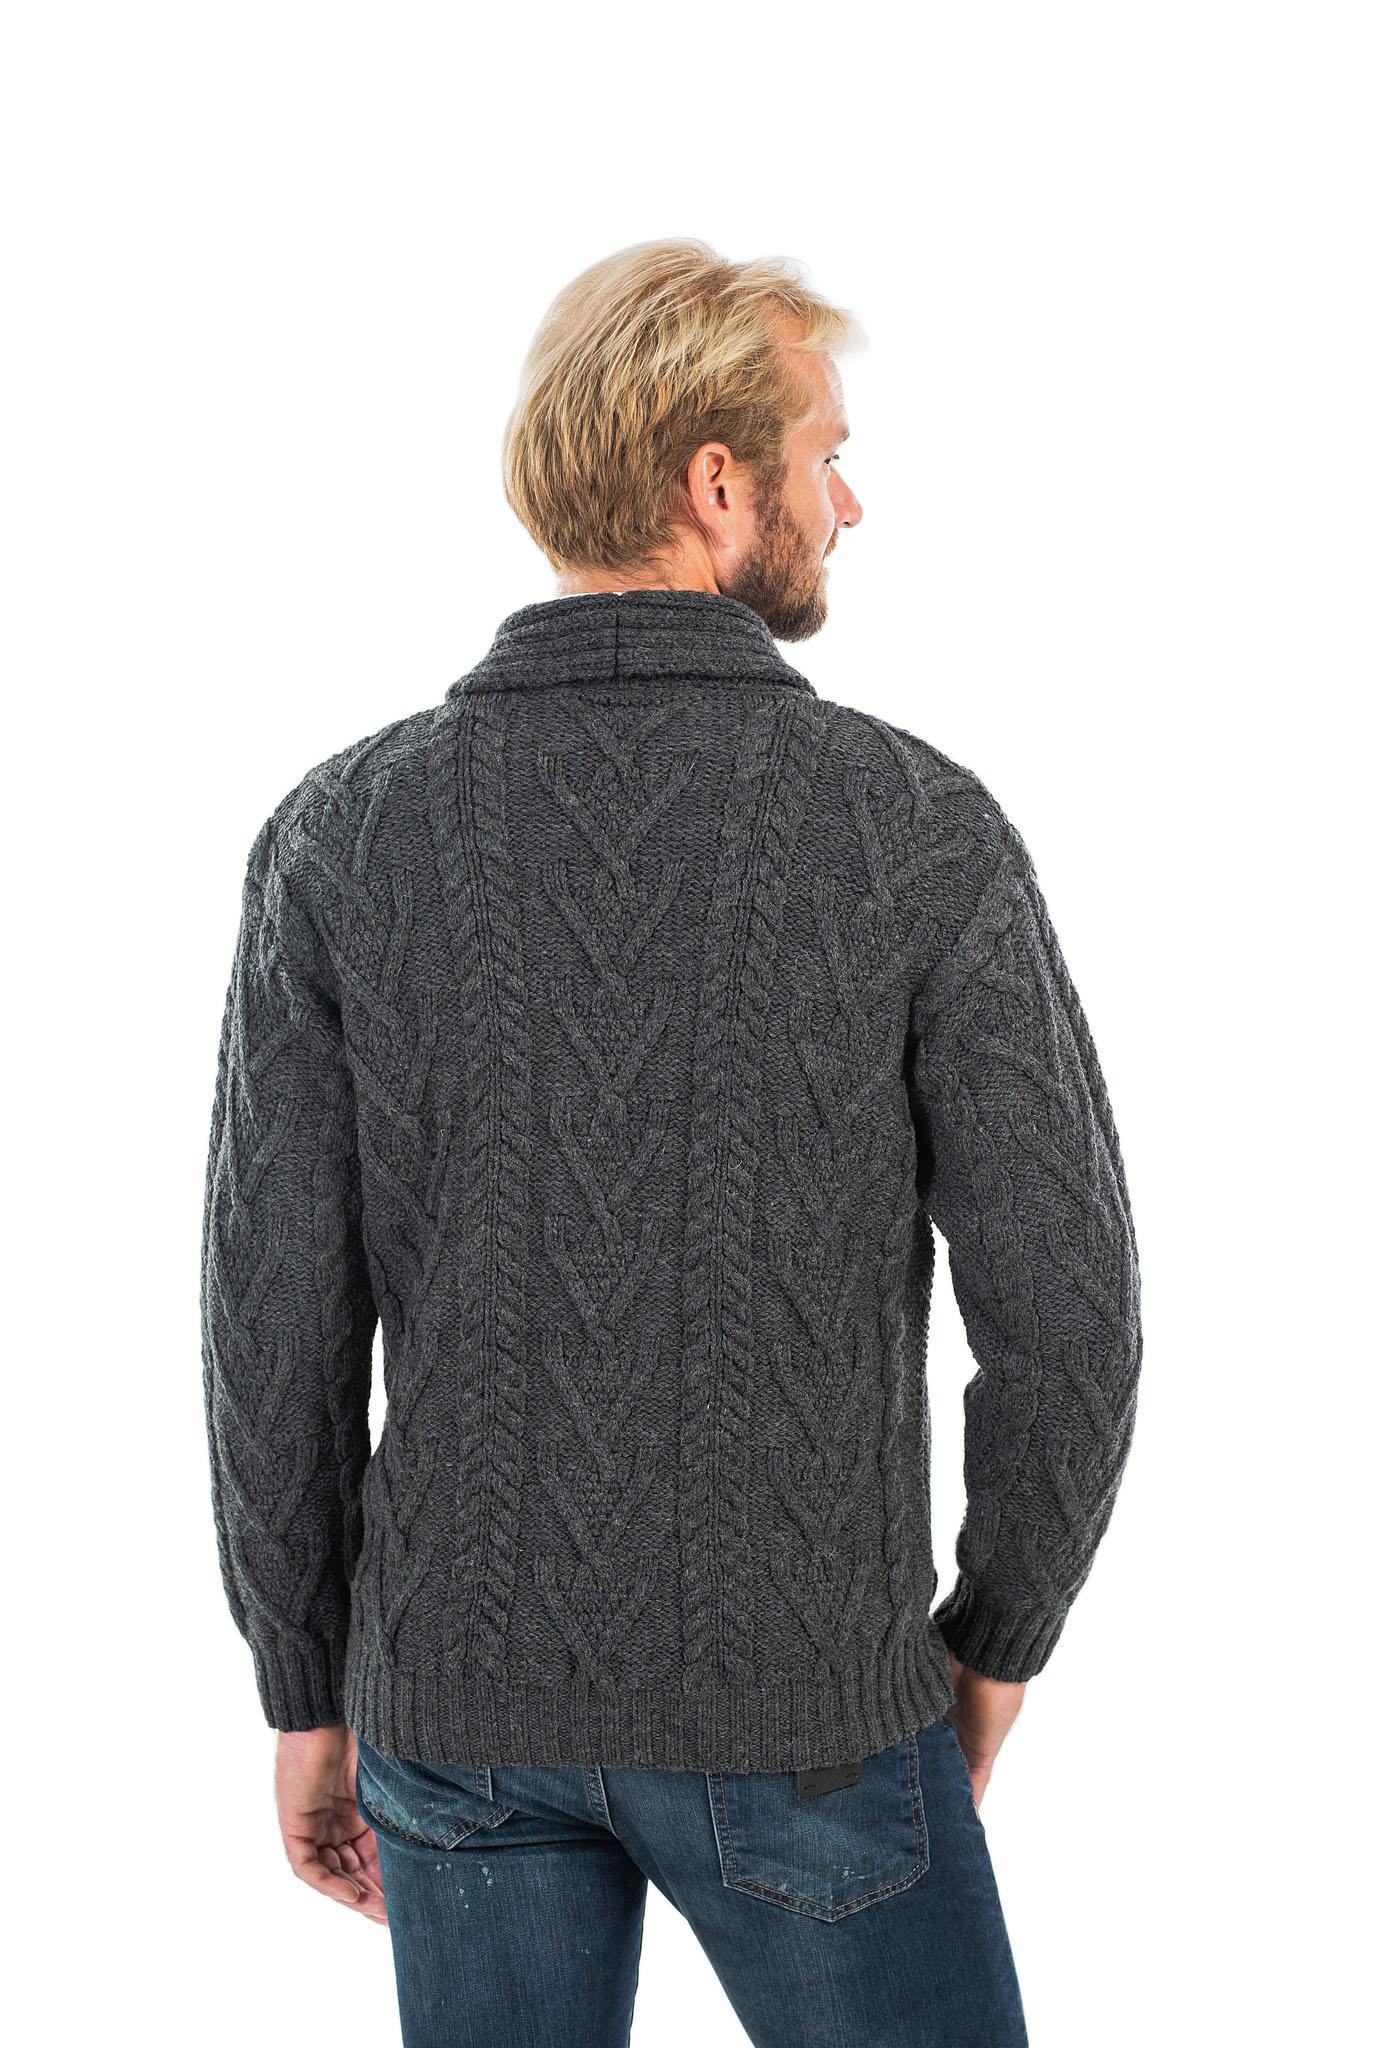 SAOL-Mens-Irish-Merino-Wool-Cardigan-Shawl-Collar-Front-Pockets-Aran-Cable-Knit thumbnail 31